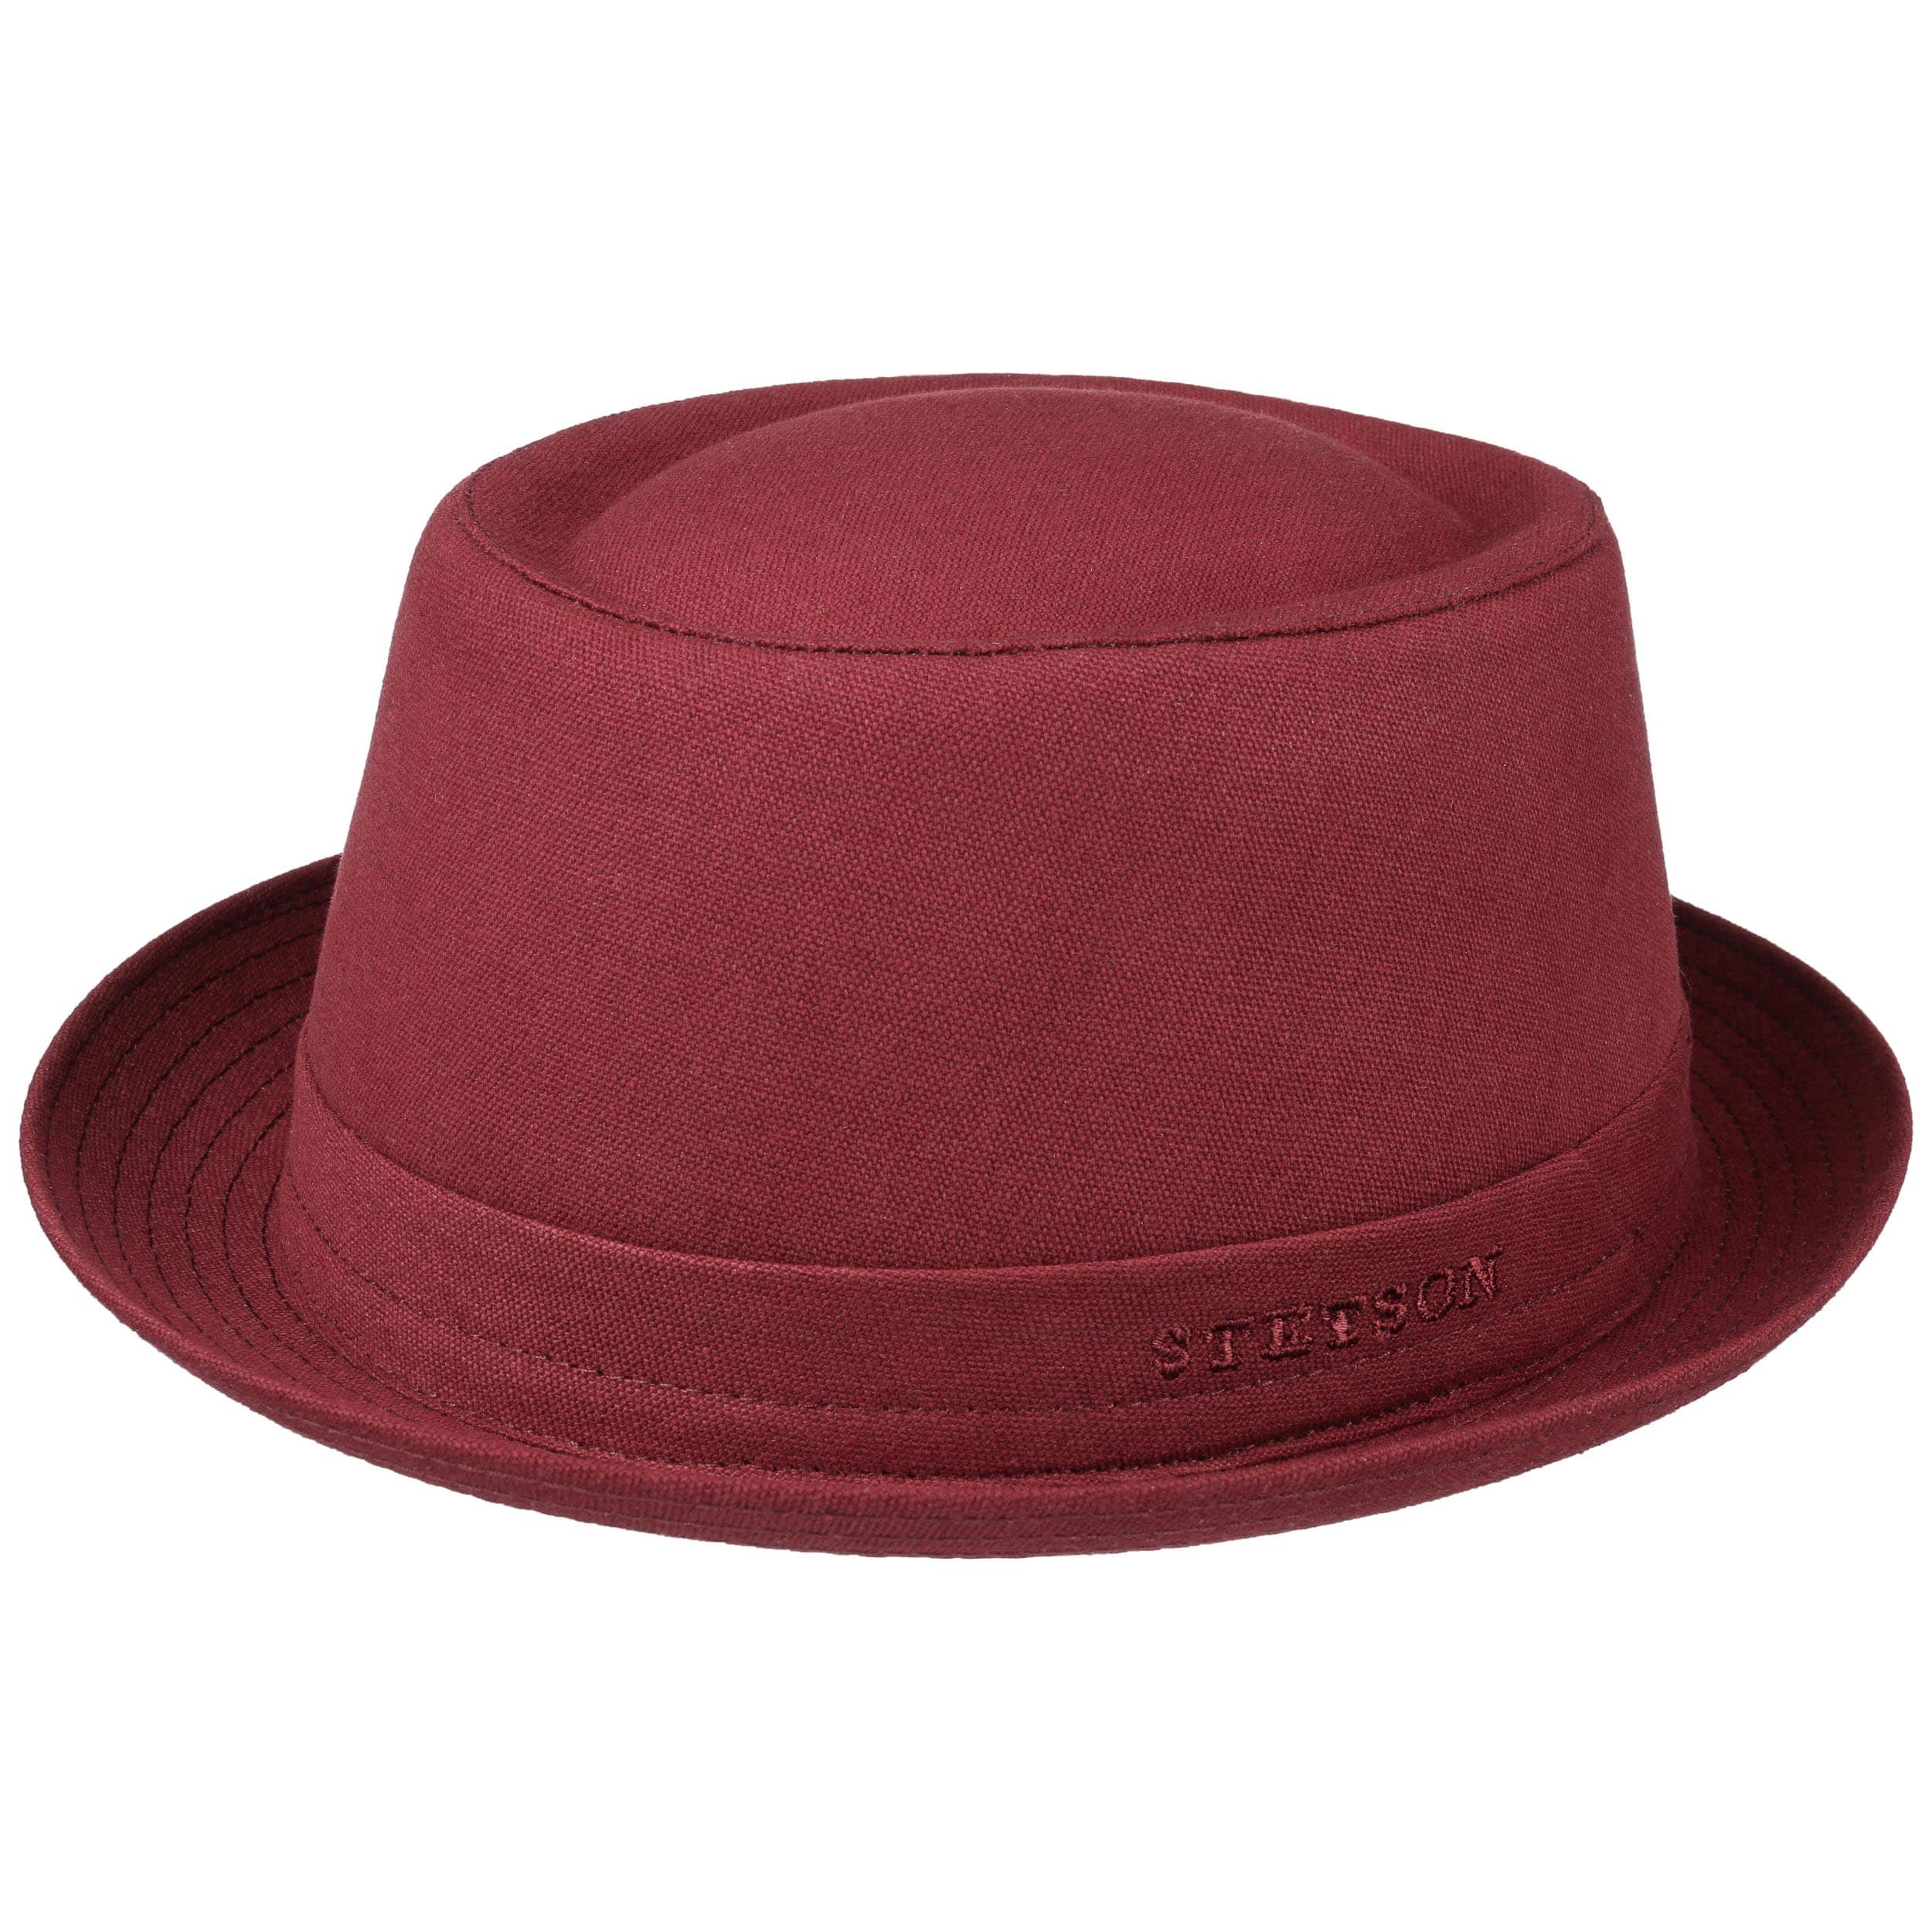 376e28be23315 ... Sombrero Pork Pie Athens Cotton by Stetson - rojo oscuro 4 ...